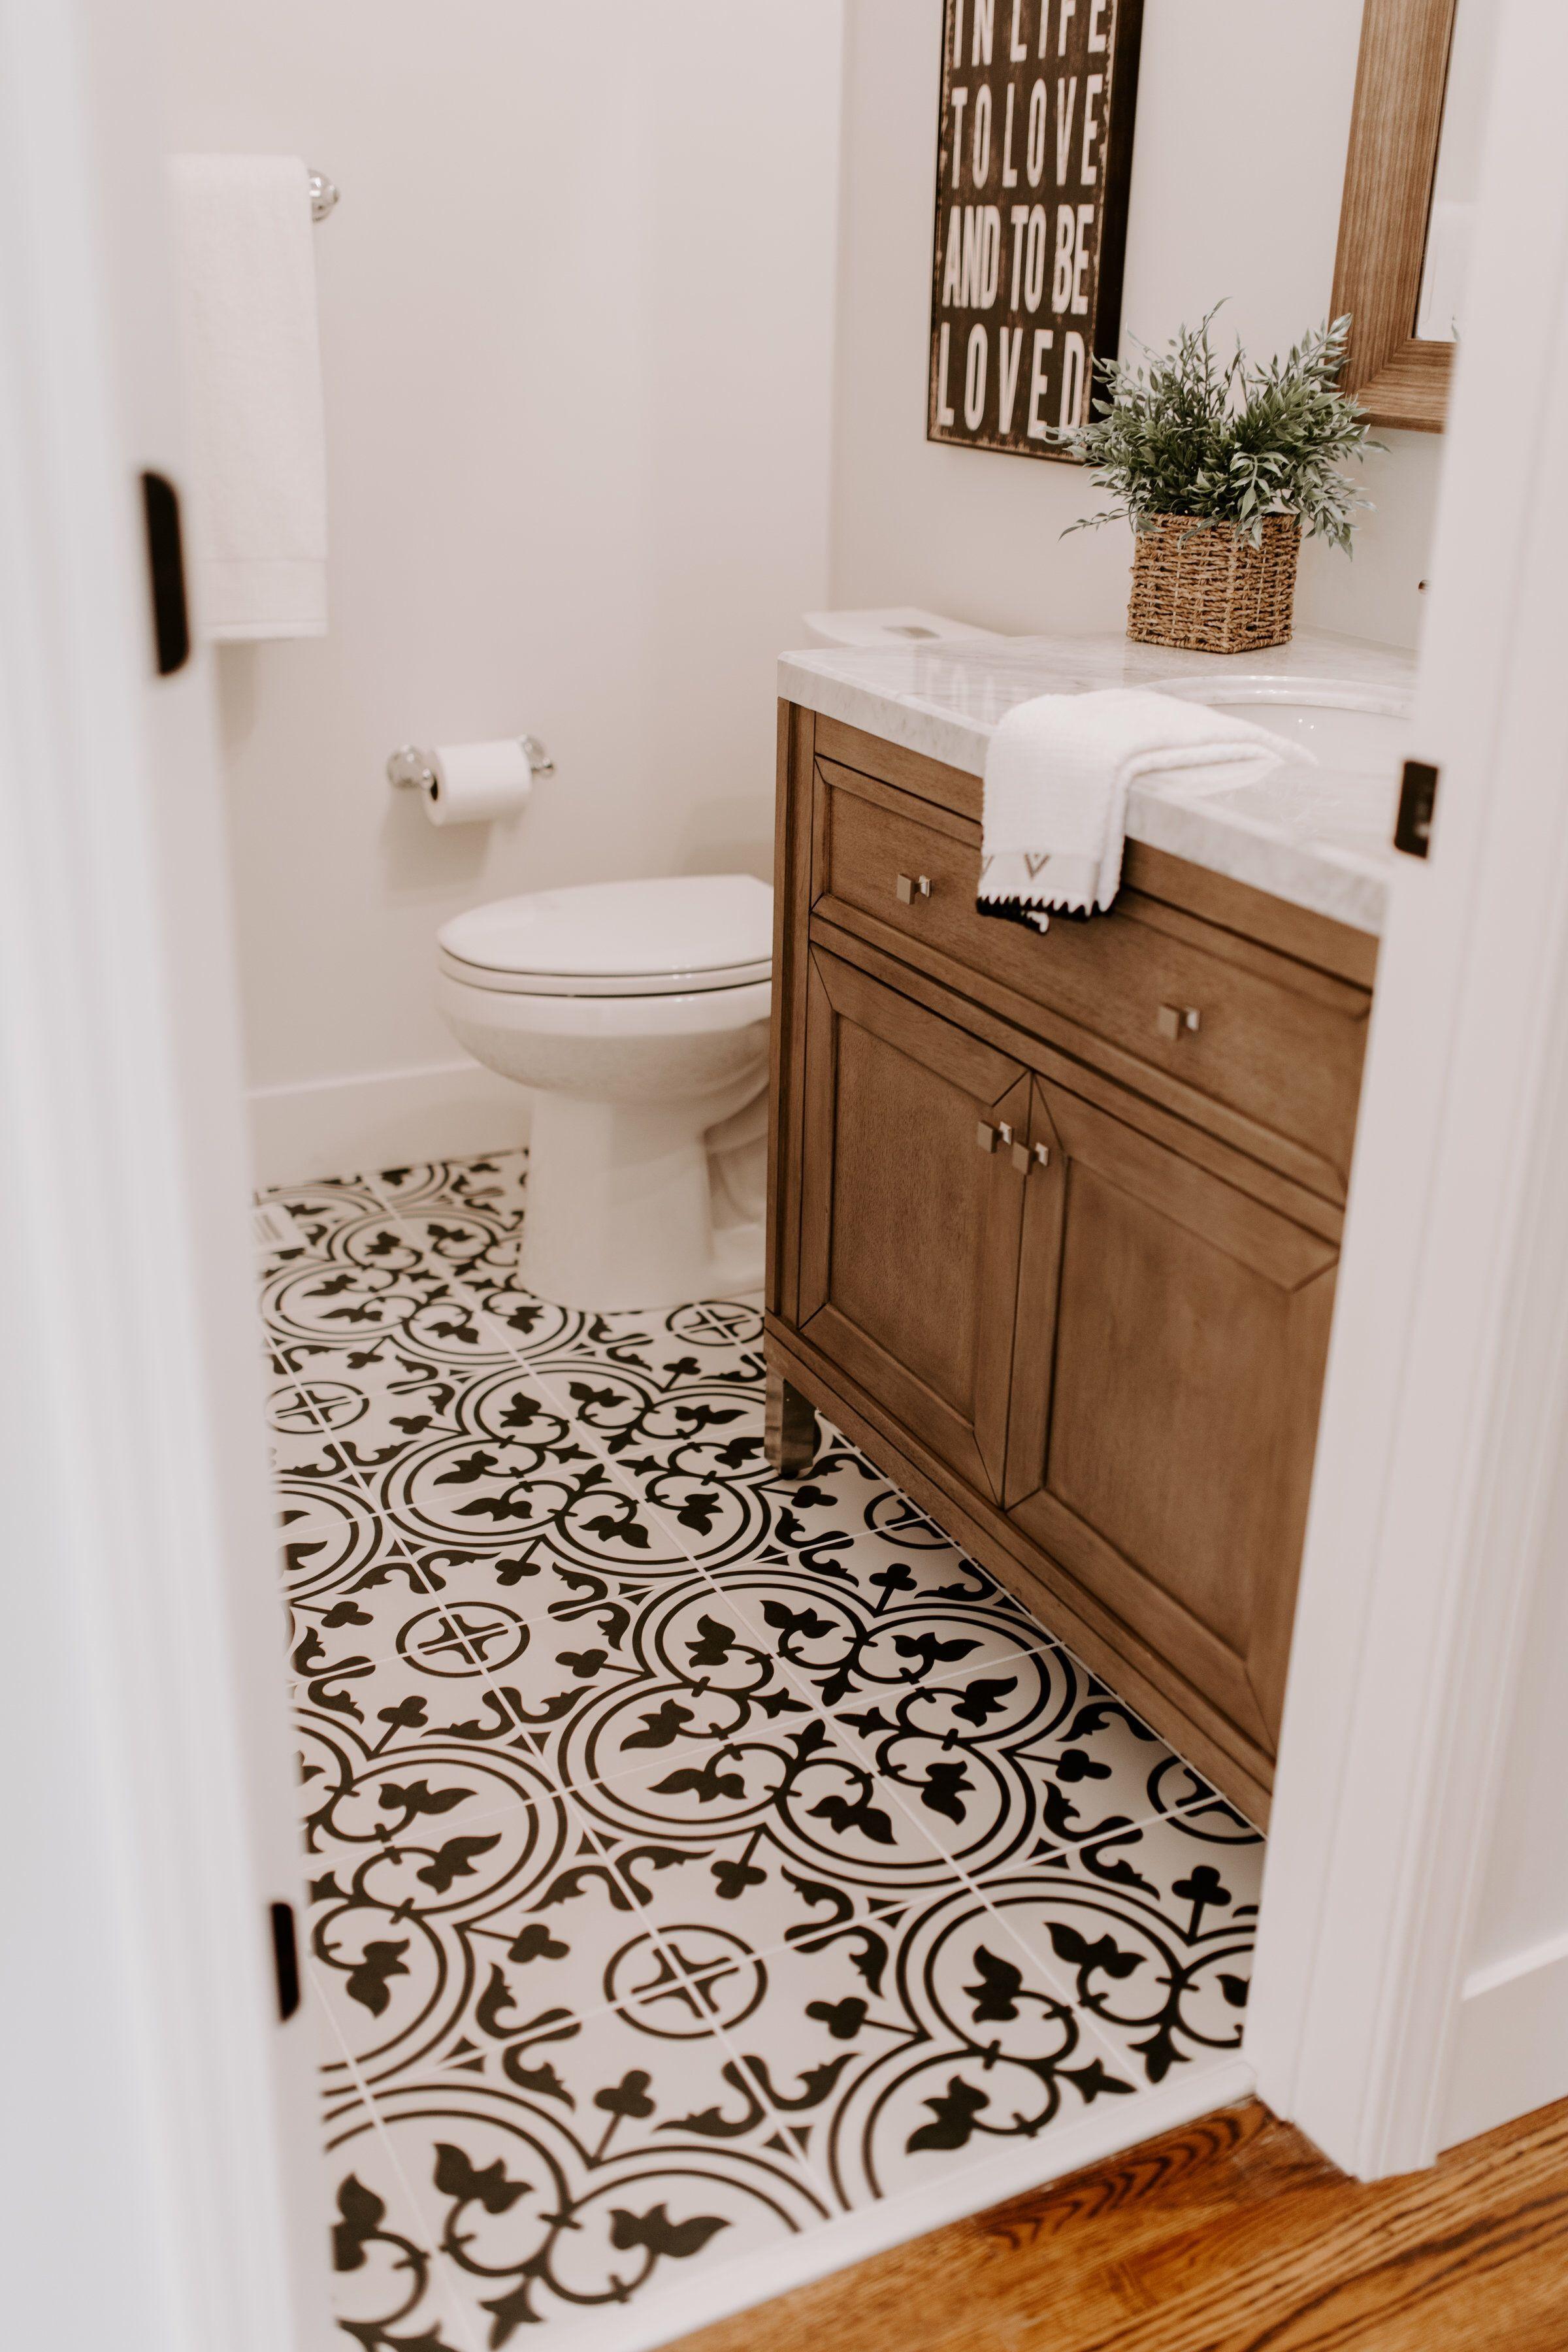 Pin By Haley On Meine Gemerkten Pins In 2021 Bathroom Style Walnut Vanity Black And White Tiles White walnut bathroom remodel